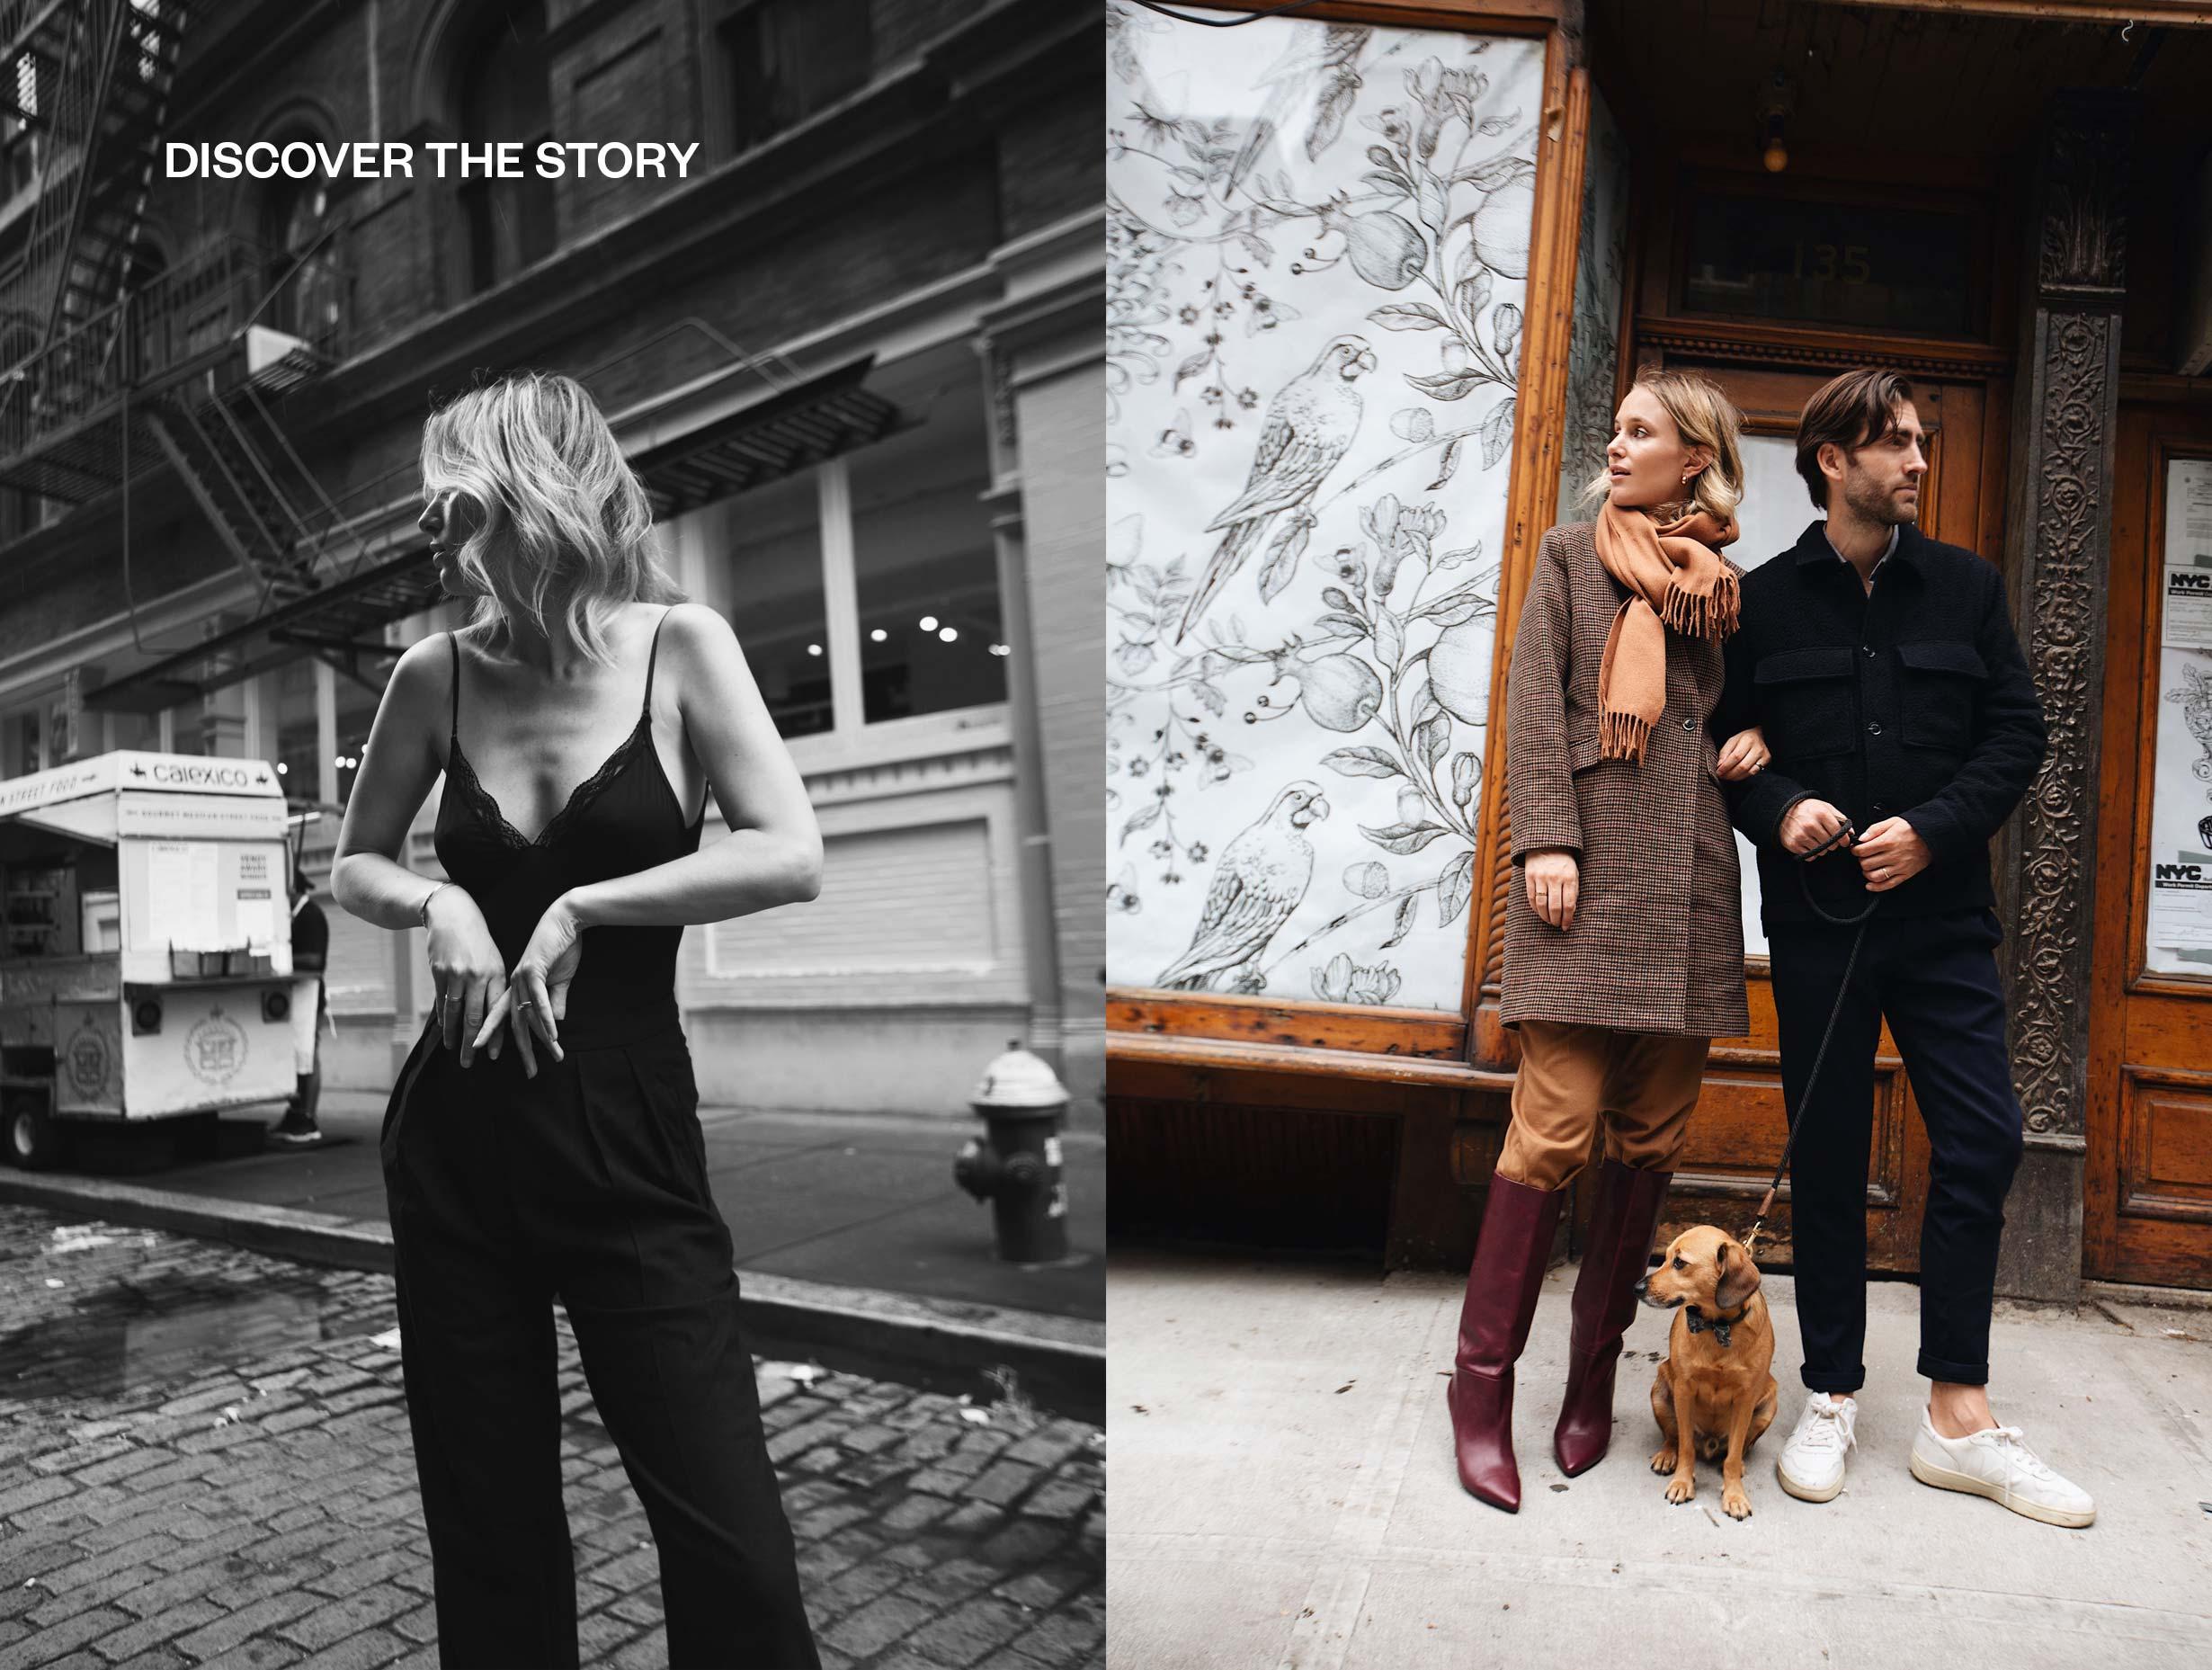 Women's fashion and Men's Fashion